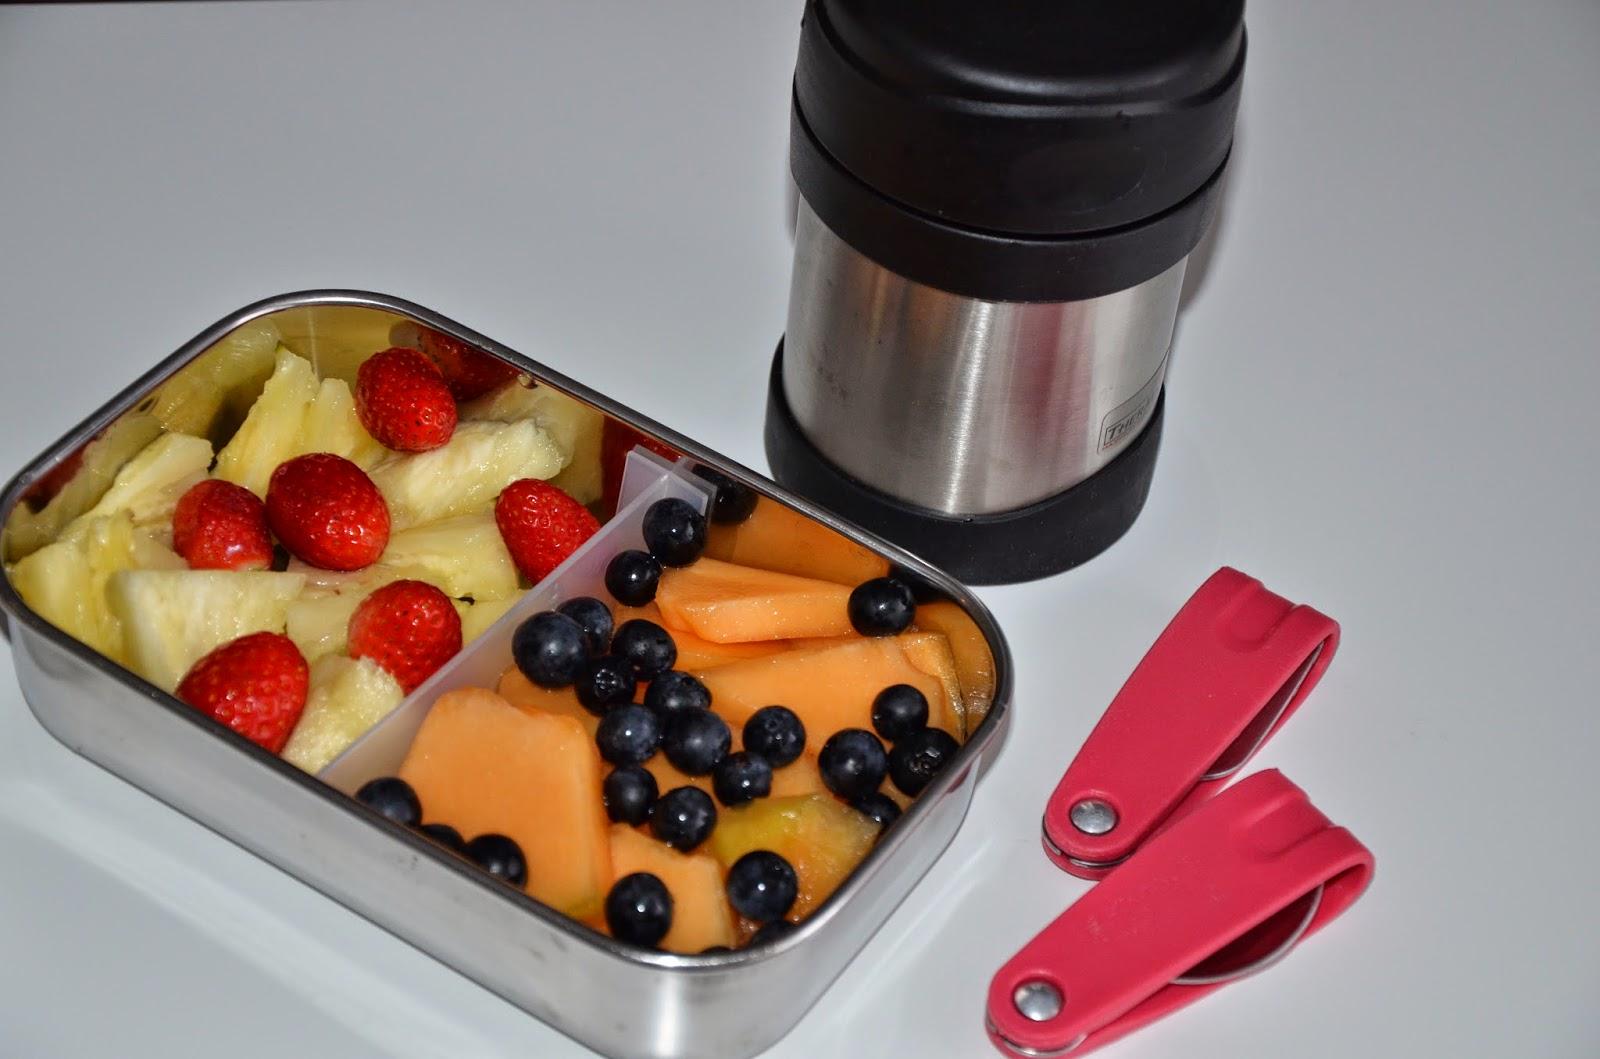 Http Homeofhomemadetreasures Blogspot Com 2015 05 Lunch Ideas For School Kids 3 Html